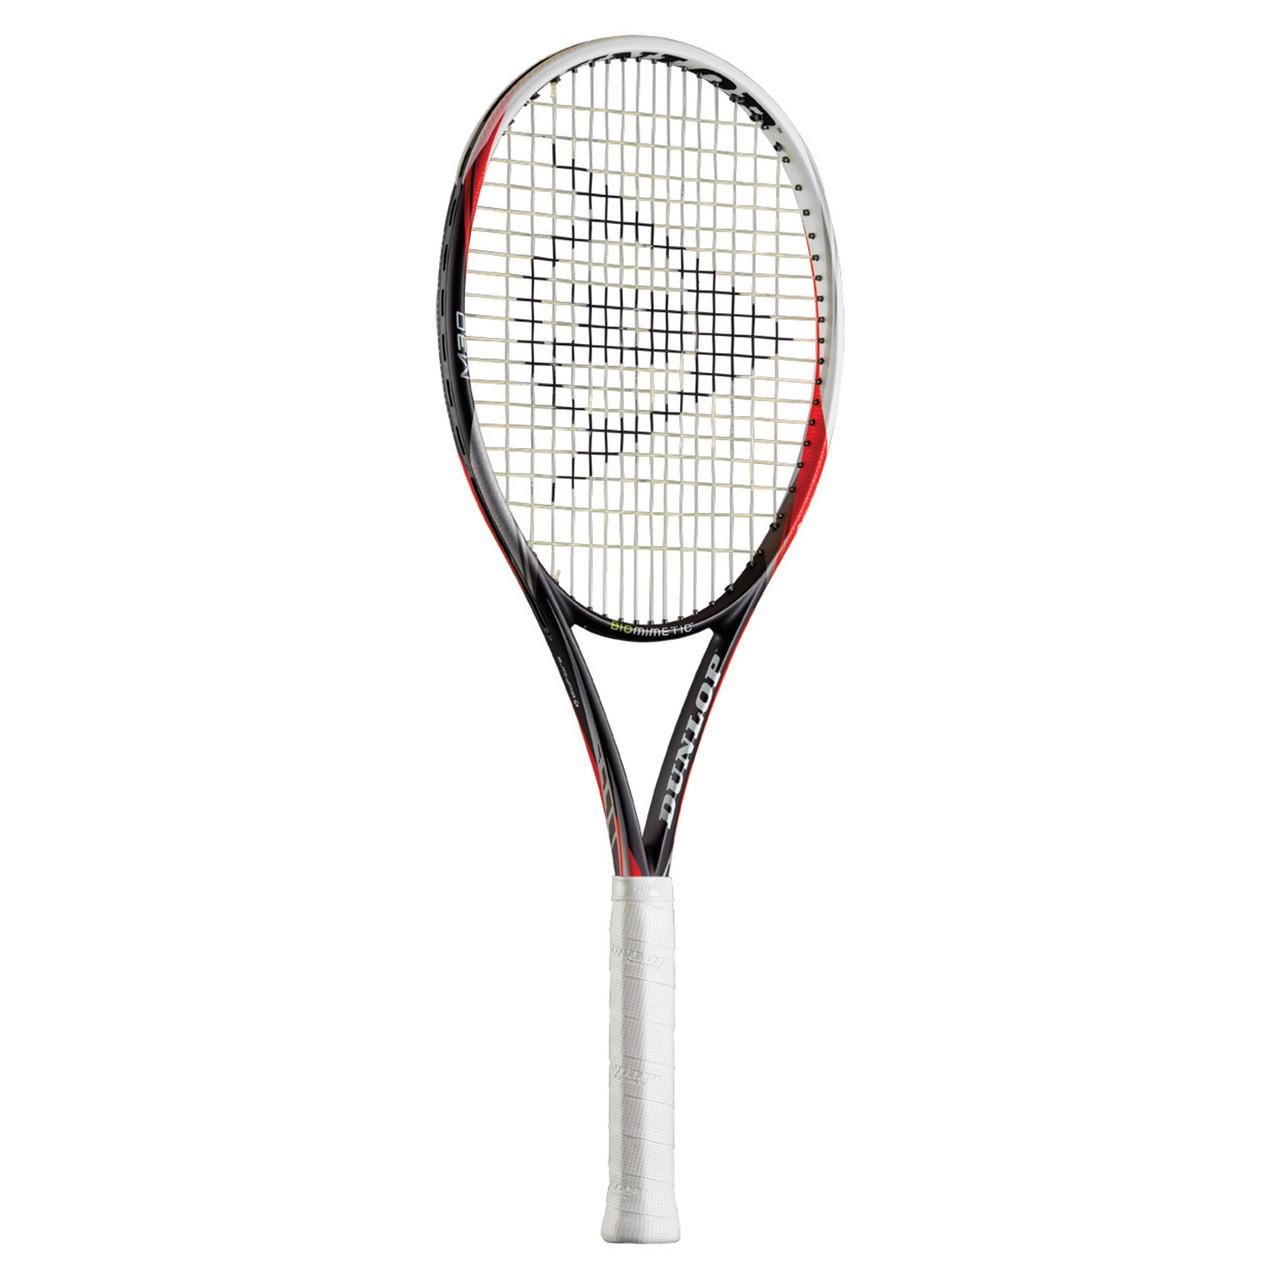 Теннисная ракетка Dunlop D Tr Biomimetic M3.0 G3 Hl 676233-NC